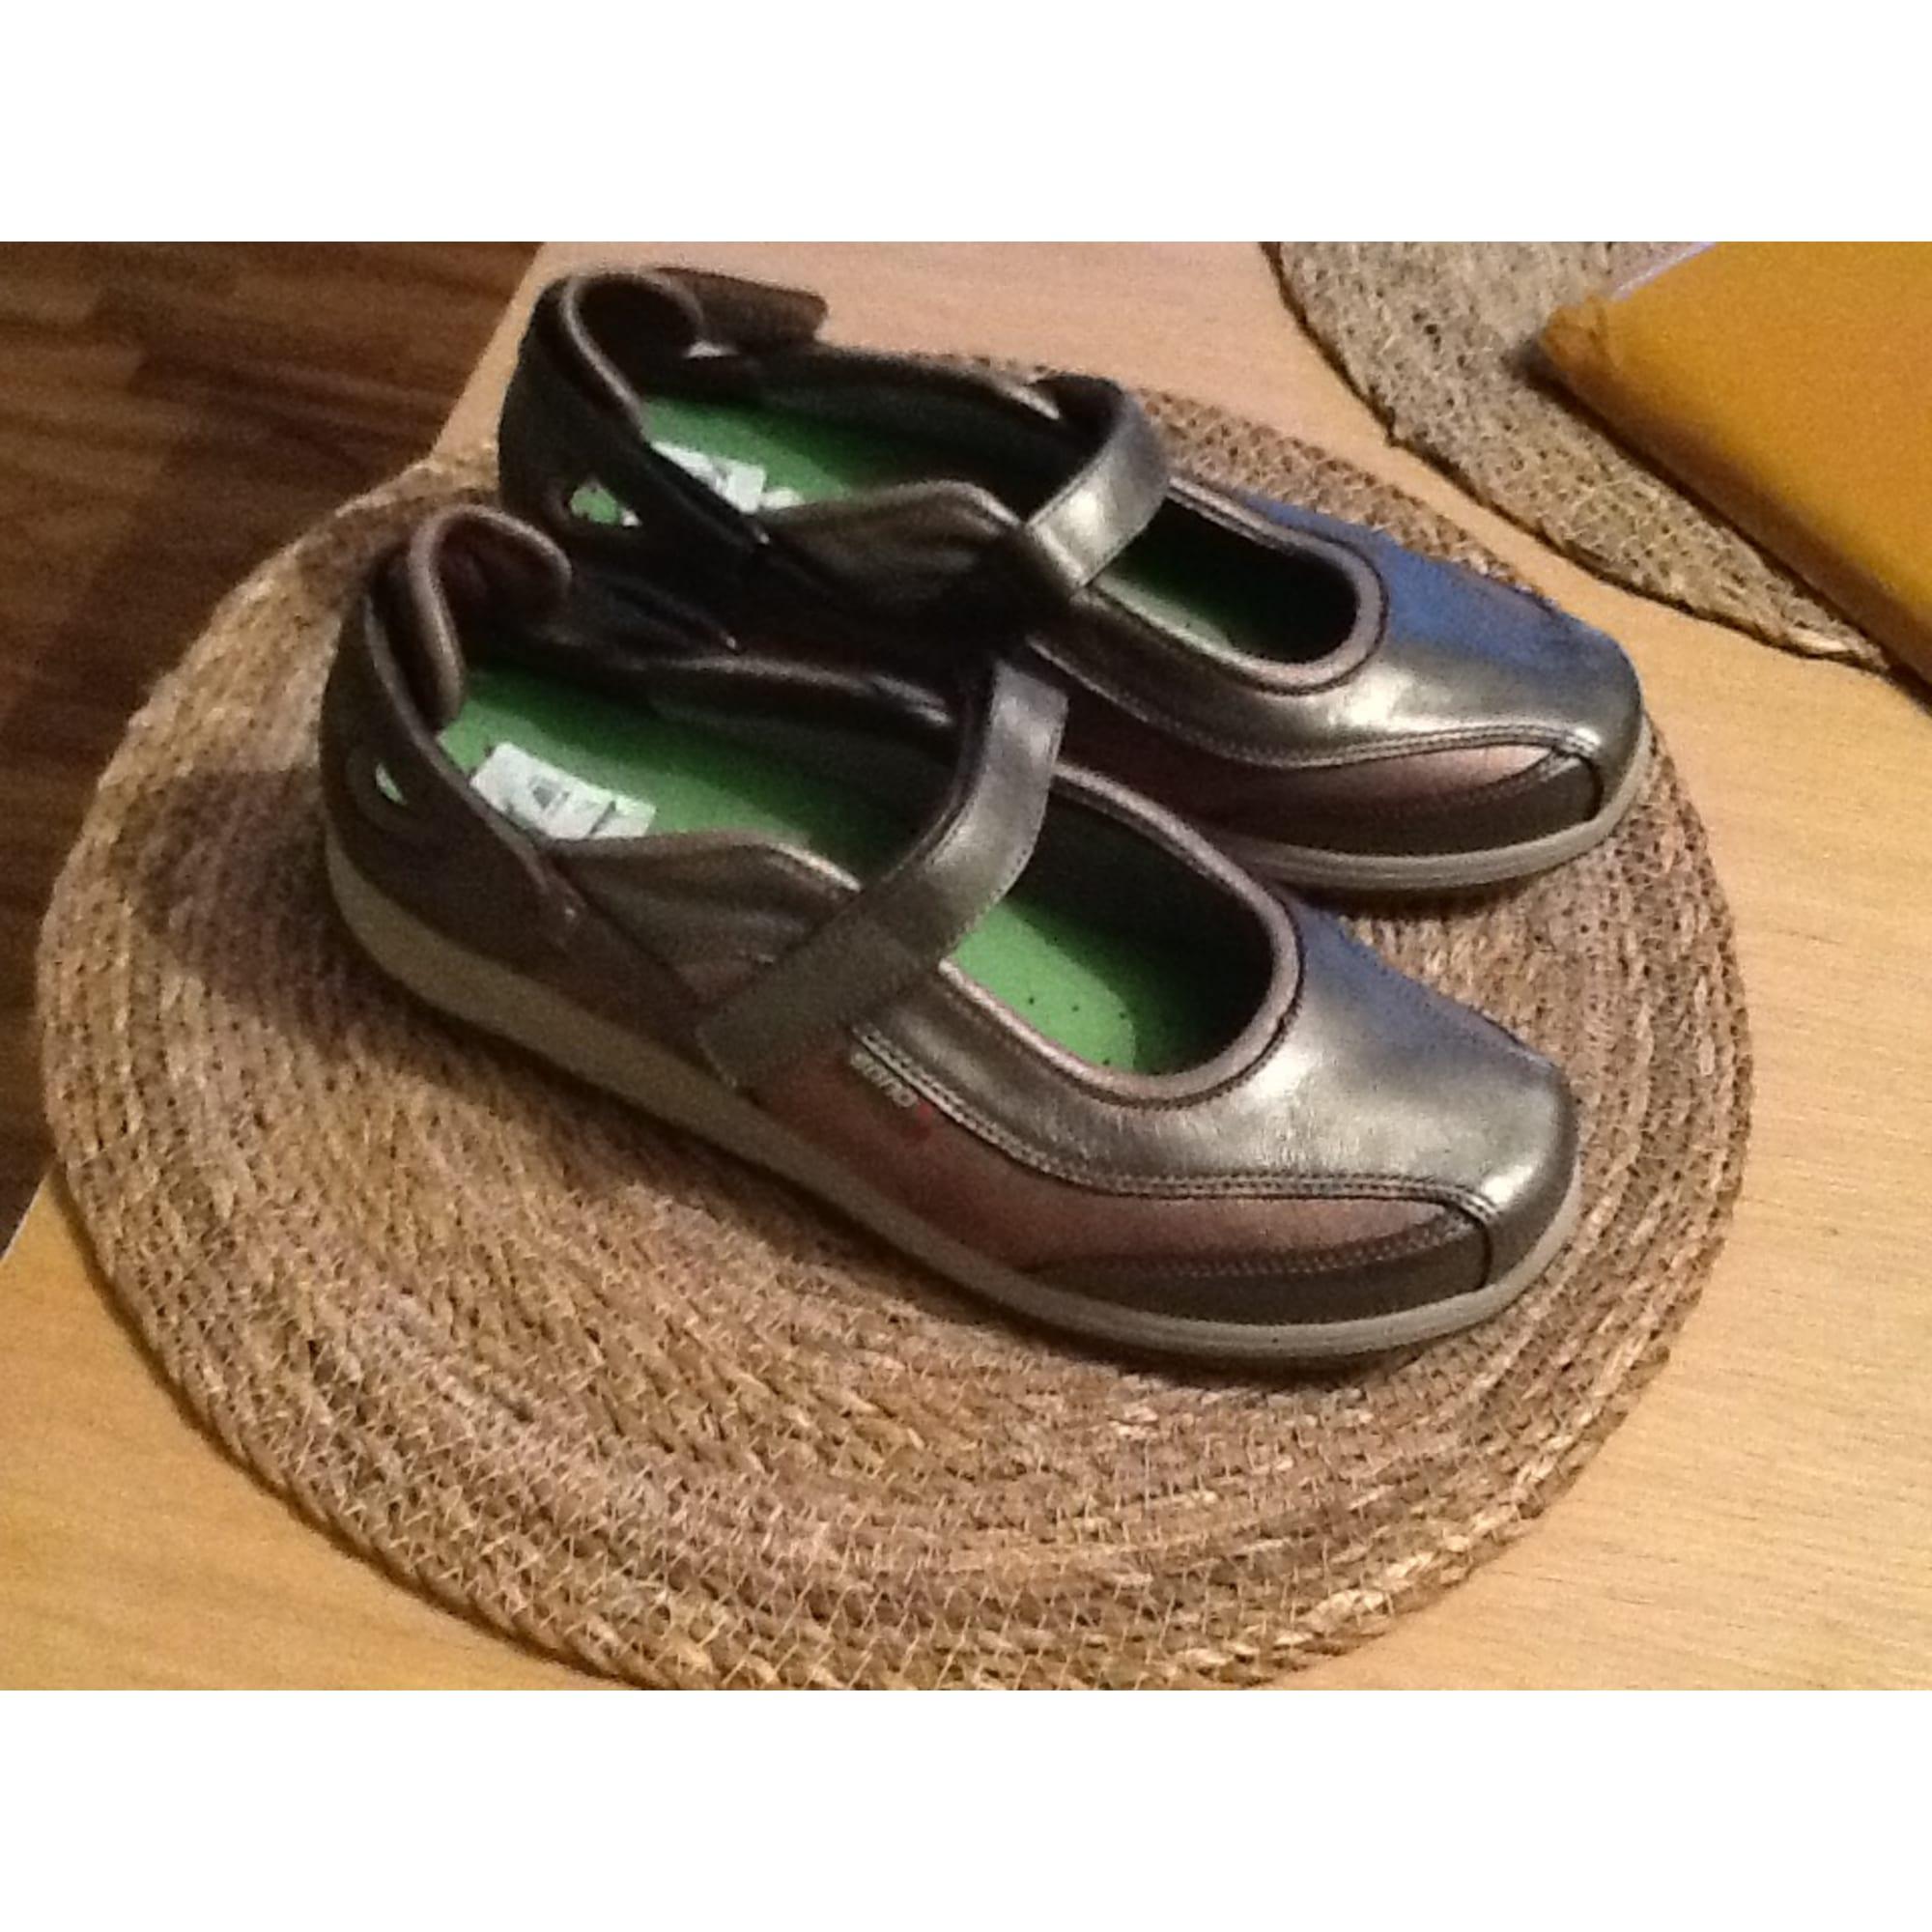 074af7ade9fe3c Chaussures de sport MEPHISTO Doré, bronze, cuivre